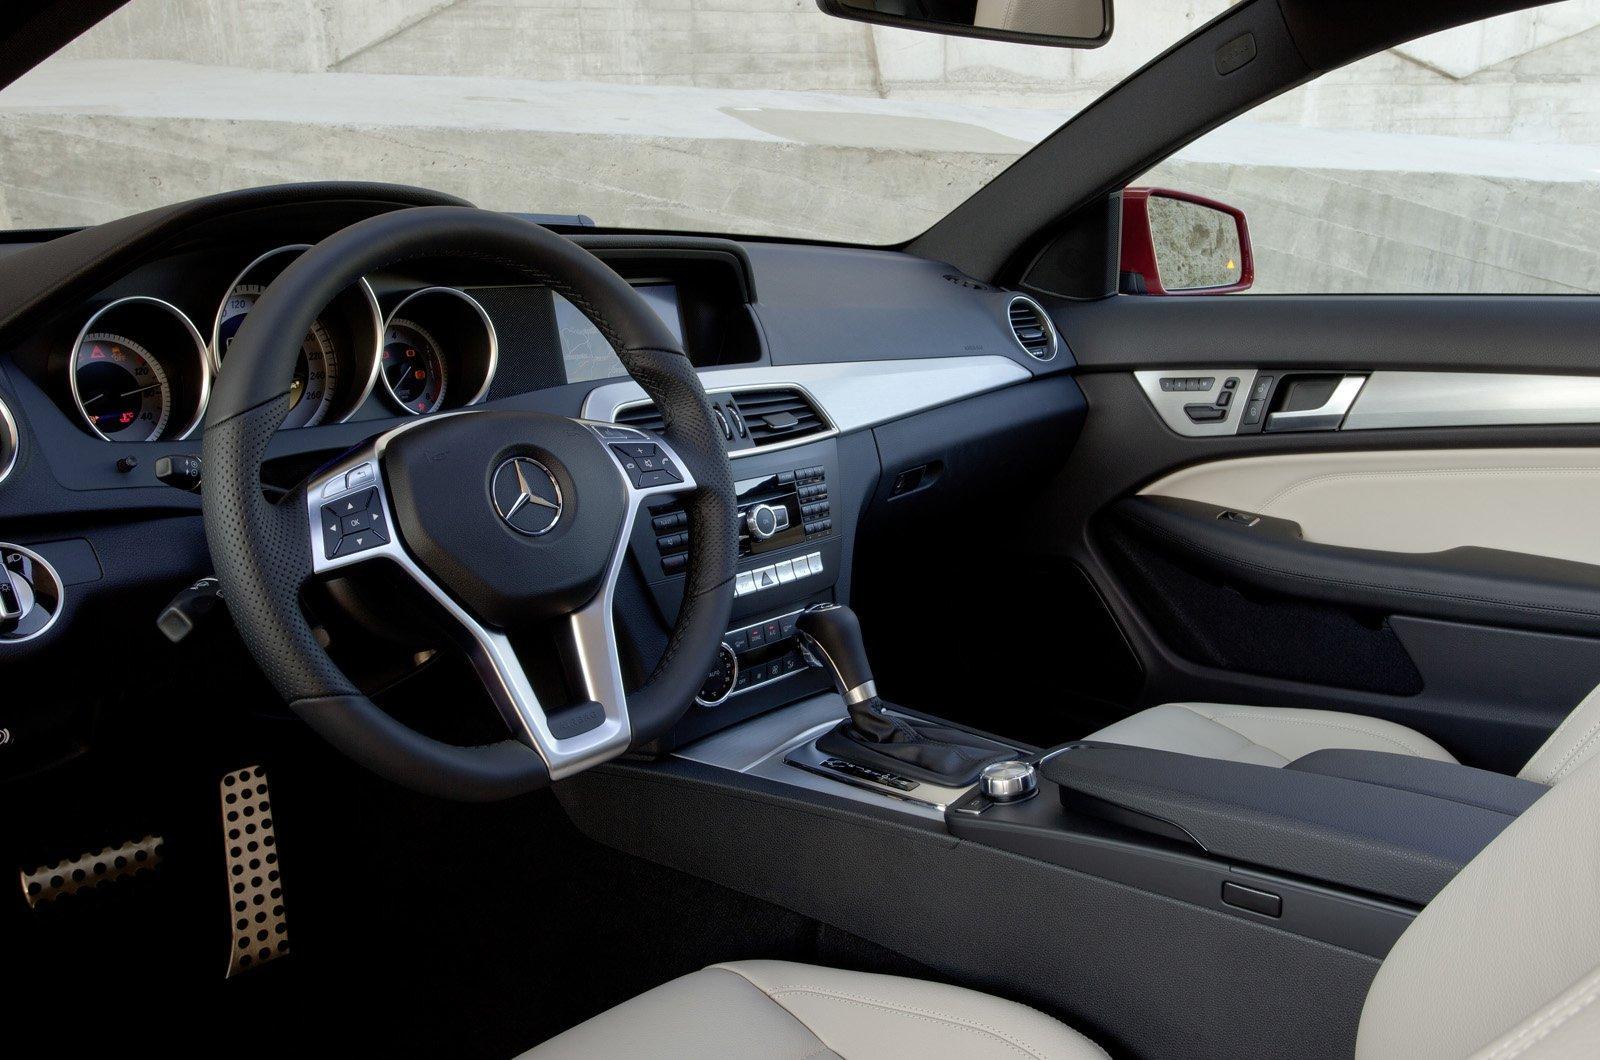 c-class-coupe-2012_03.jpg